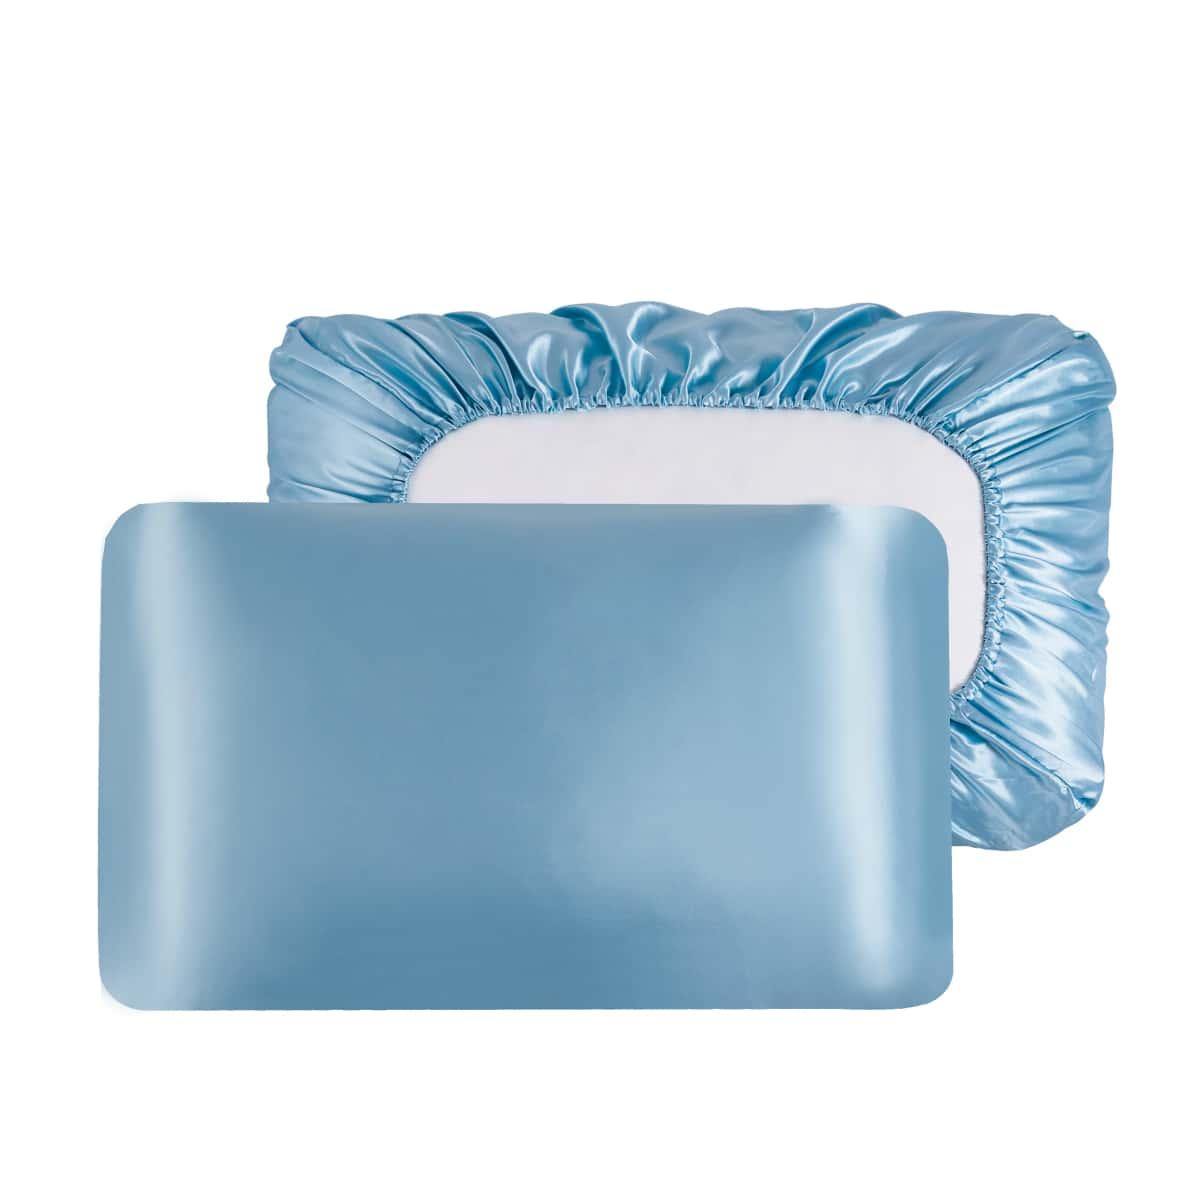 1Pair Satin Pillowcase Without Filler